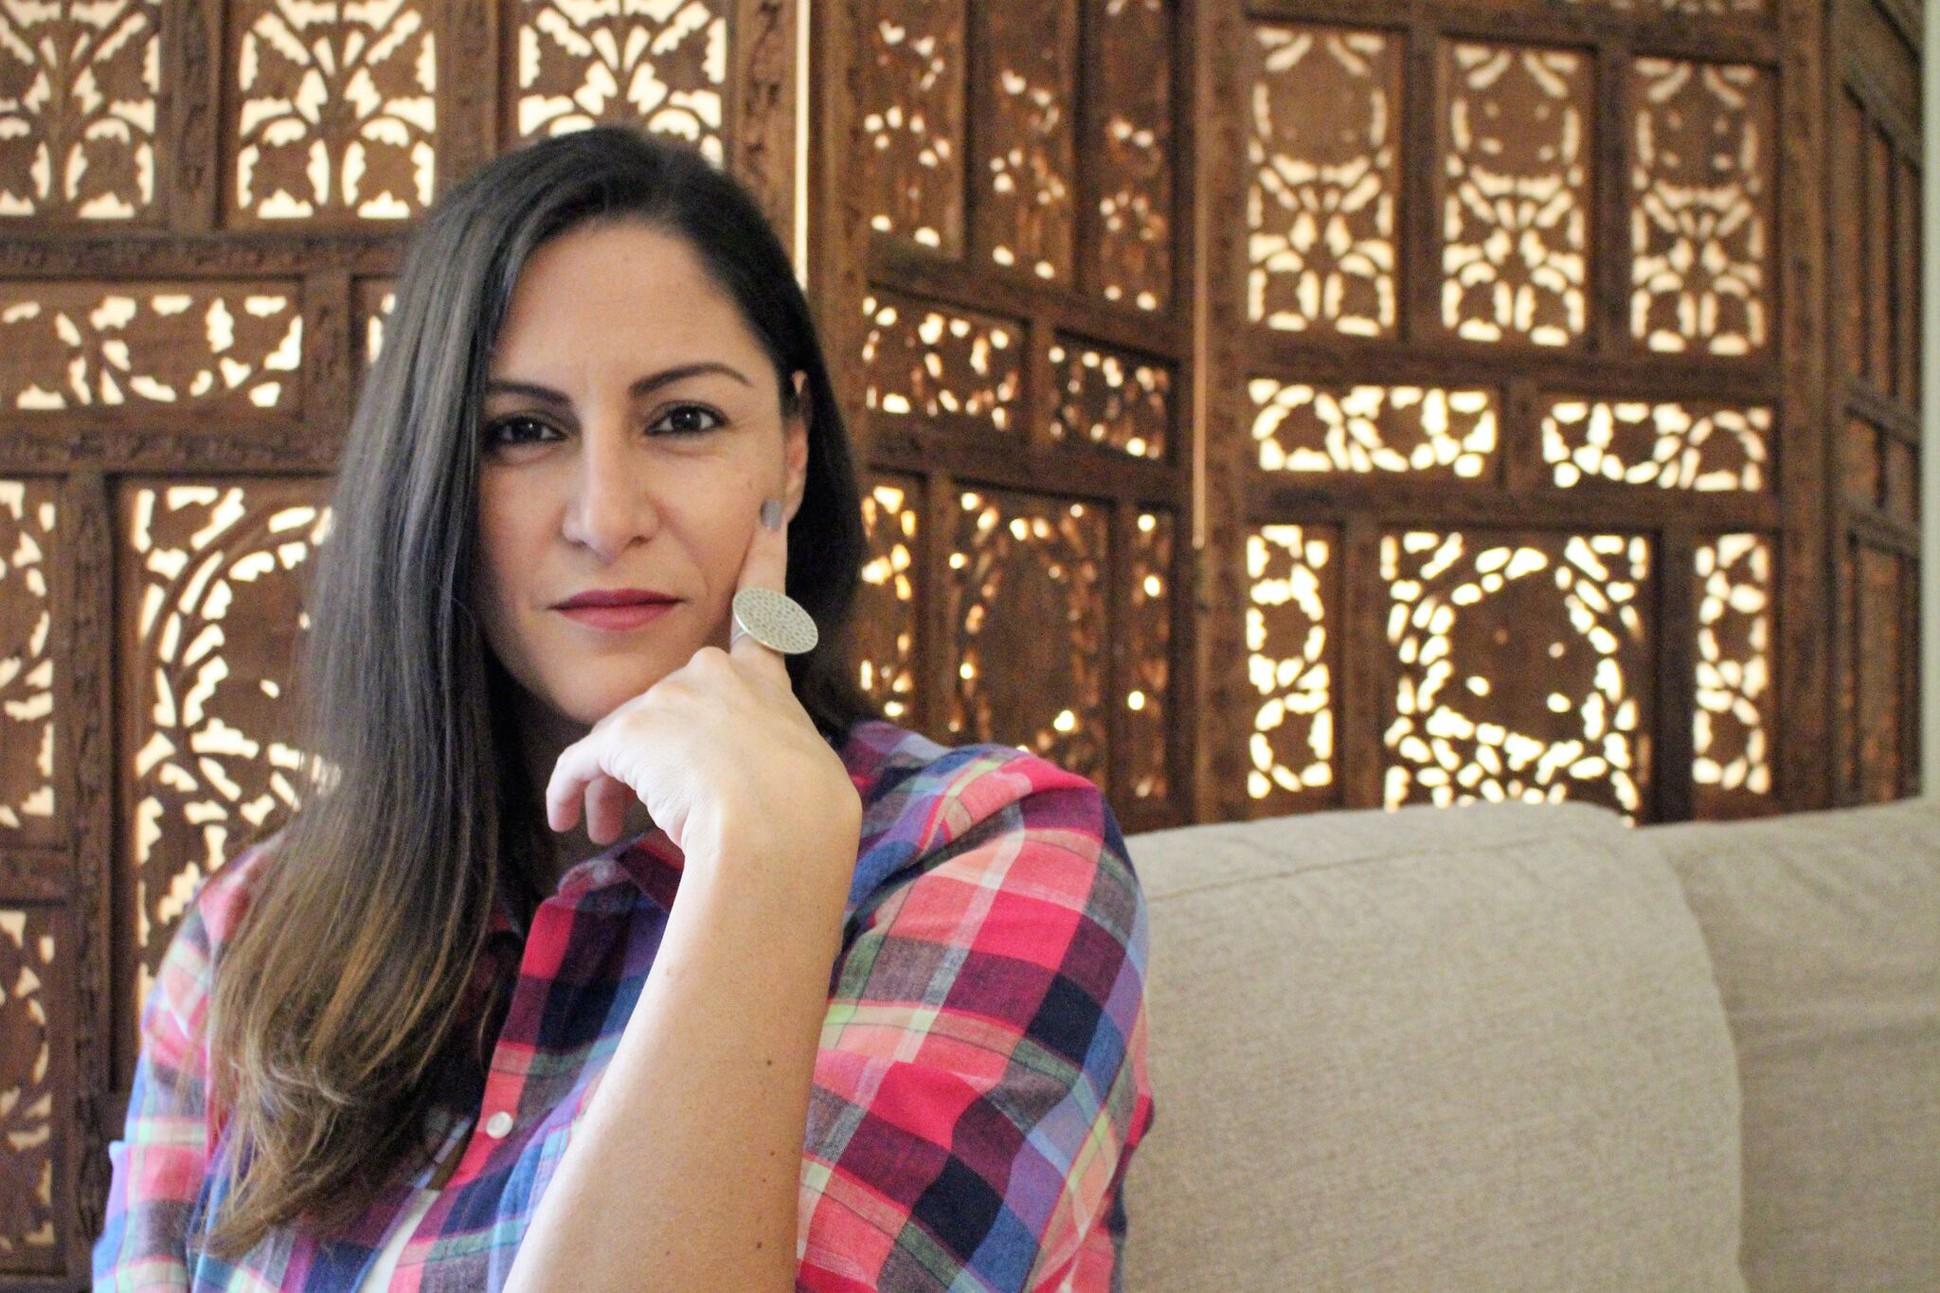 Image of Zeina Hasham Beck